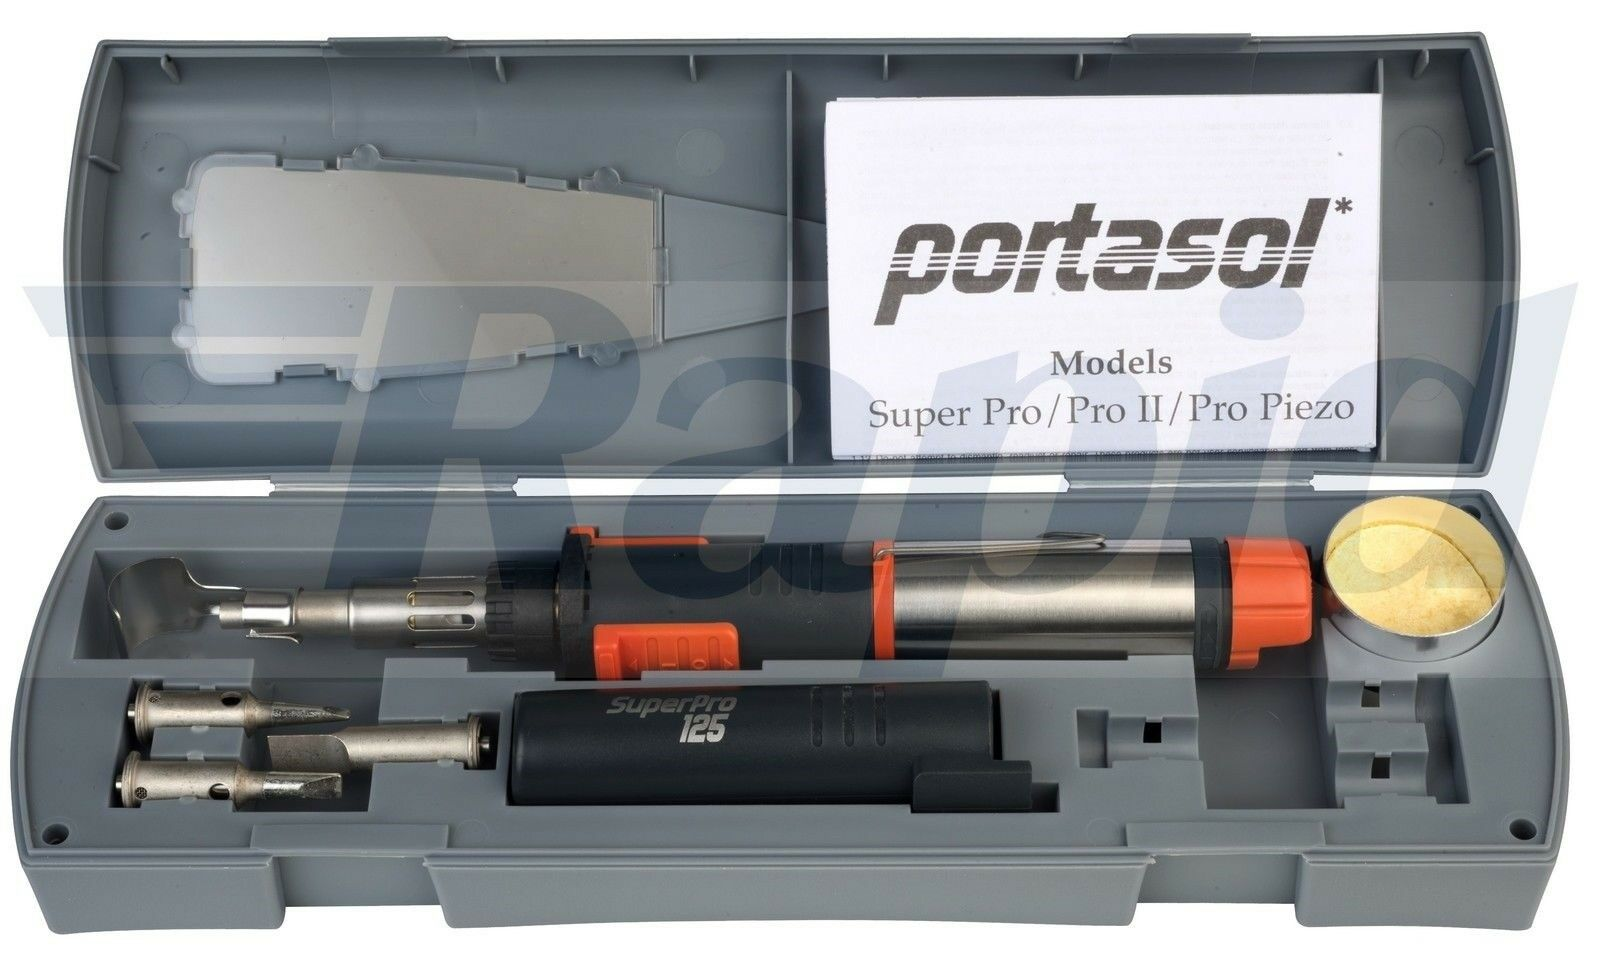 PORTASOL SUPER PRO MK2 GAS SOLDERING IRON GAS JET VENTURI SPARE SPT17